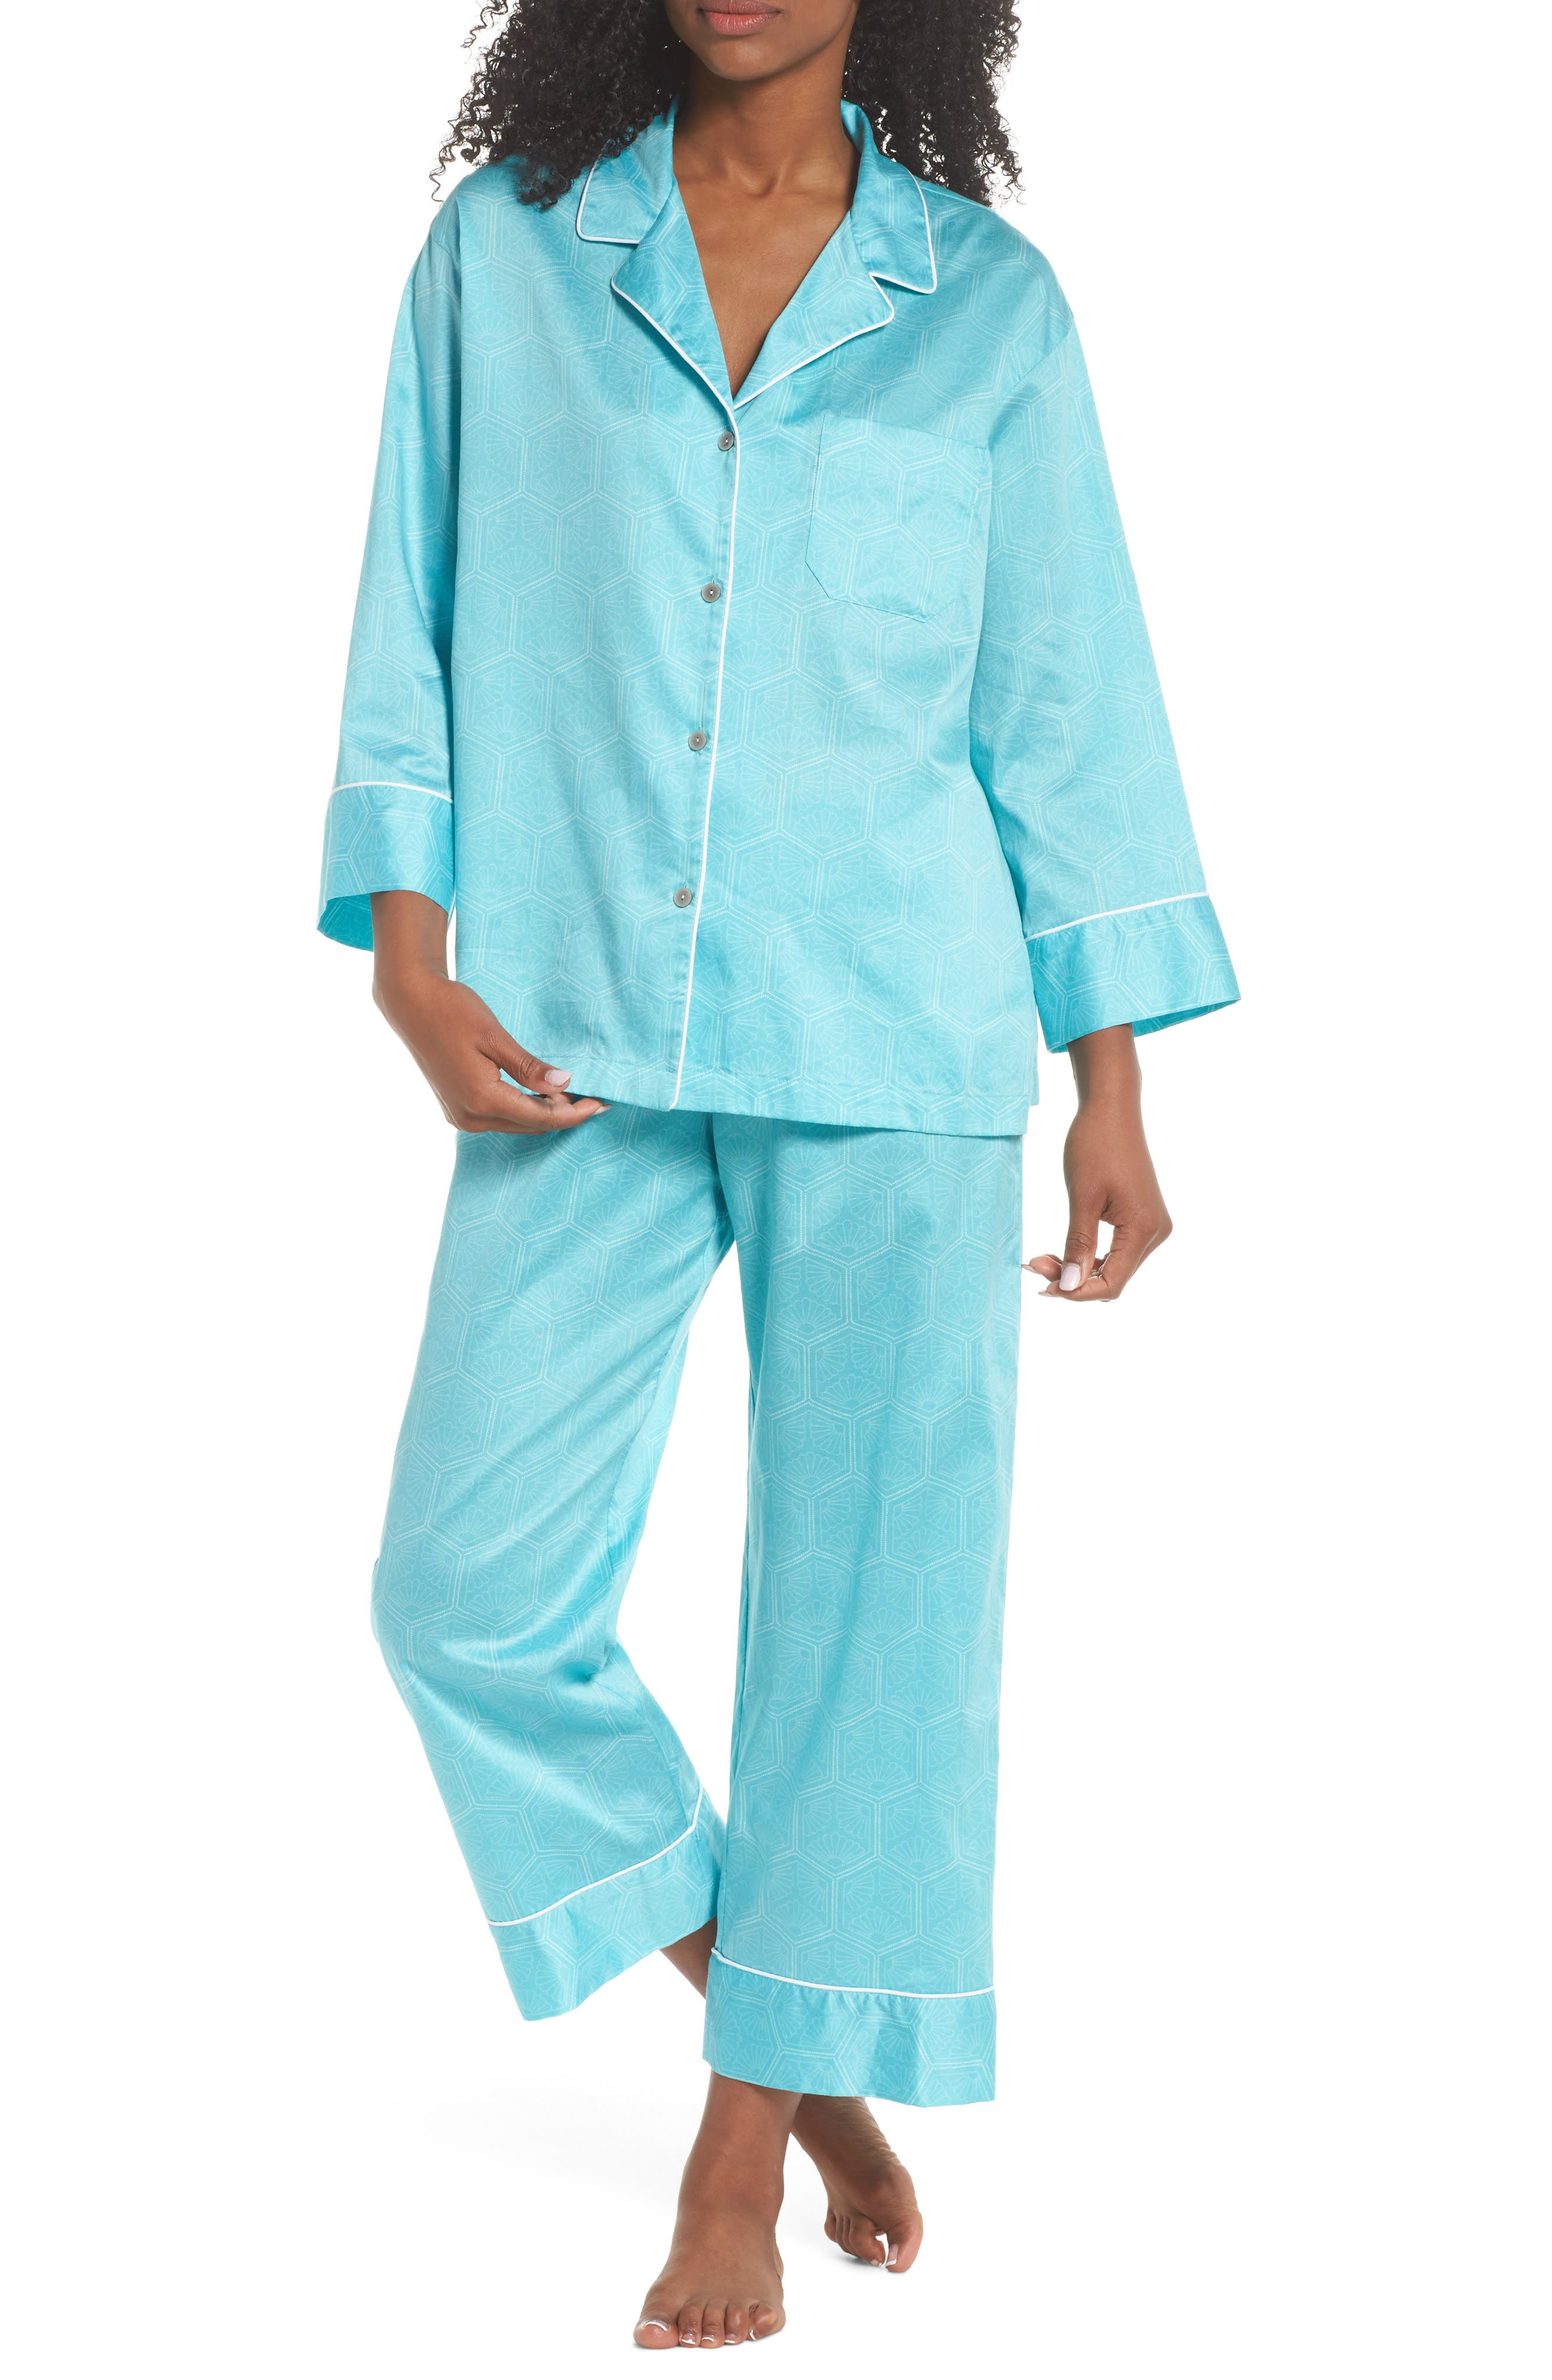 Fan Print Cotton Pajamas,                             Main thumbnail 1, color,                             440